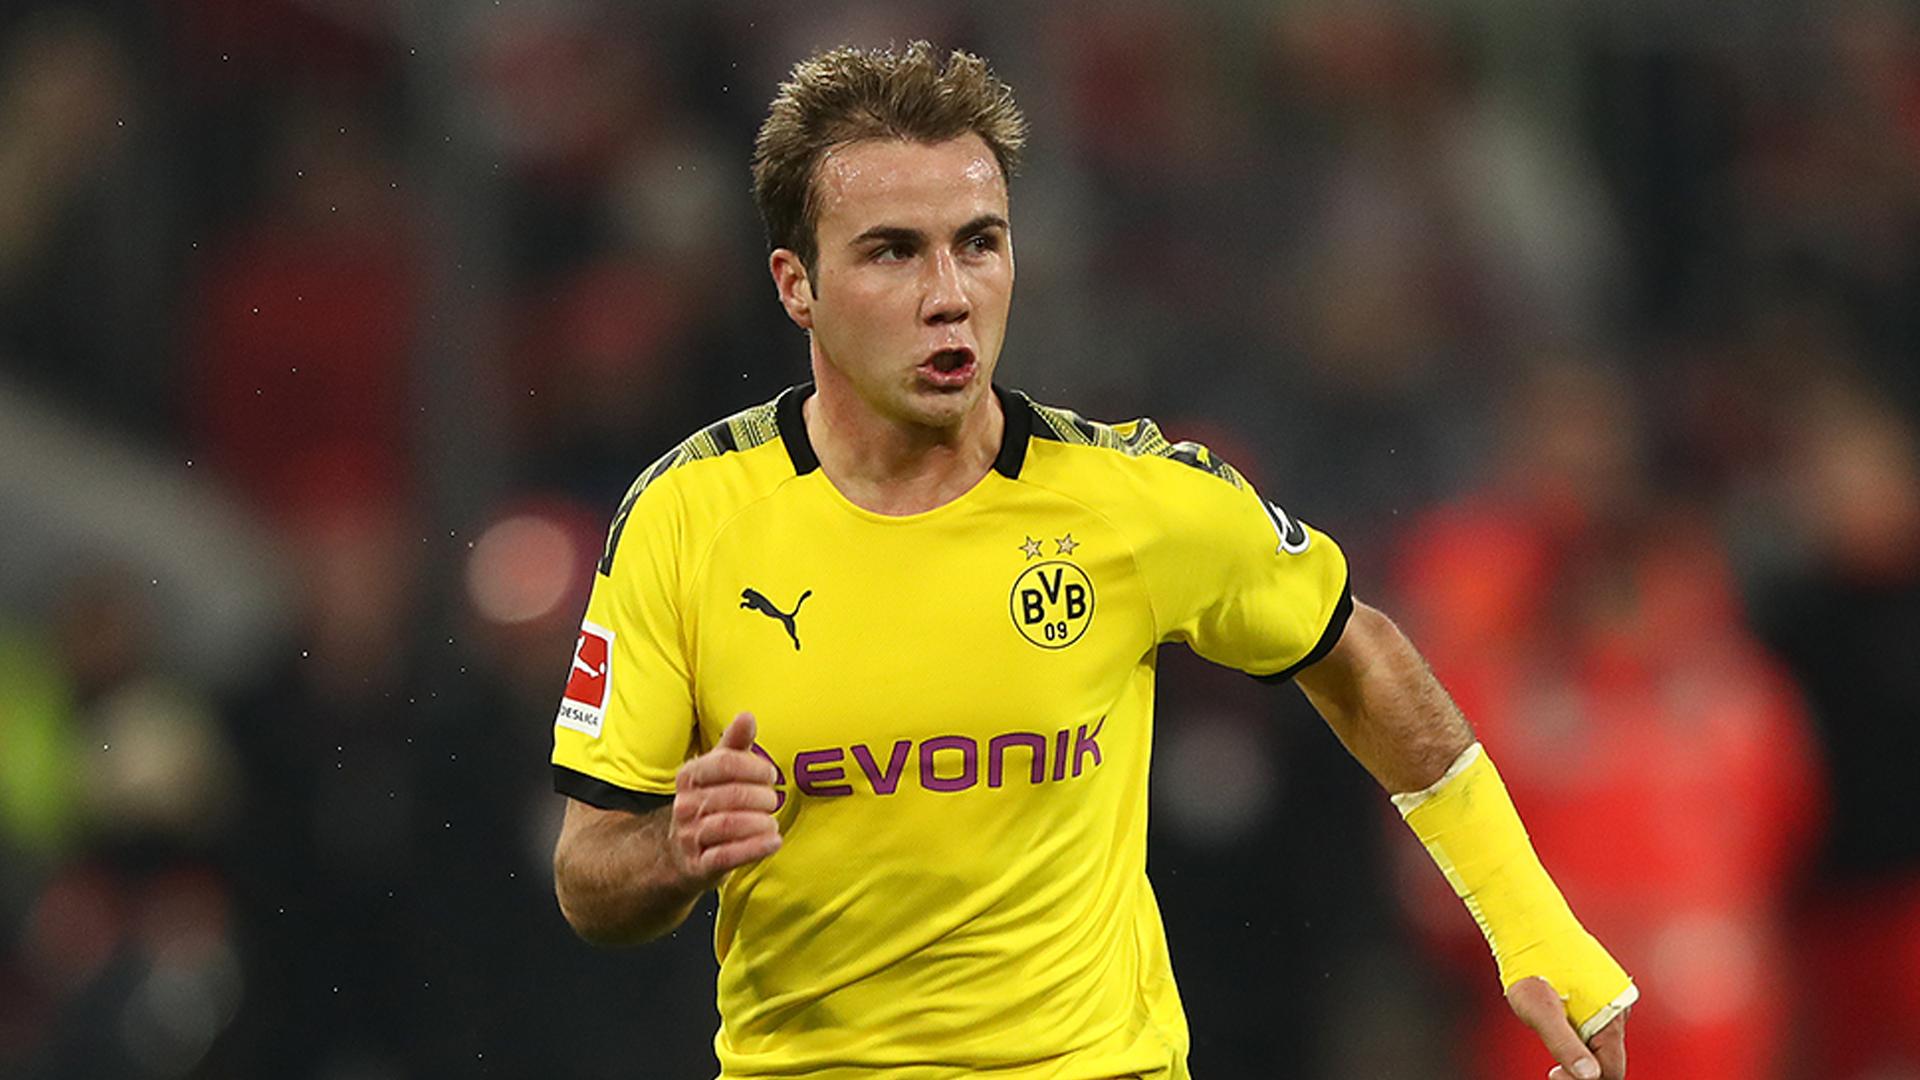 'Final decision' on Gotze's Dortmund future hasn't been made - Zorc